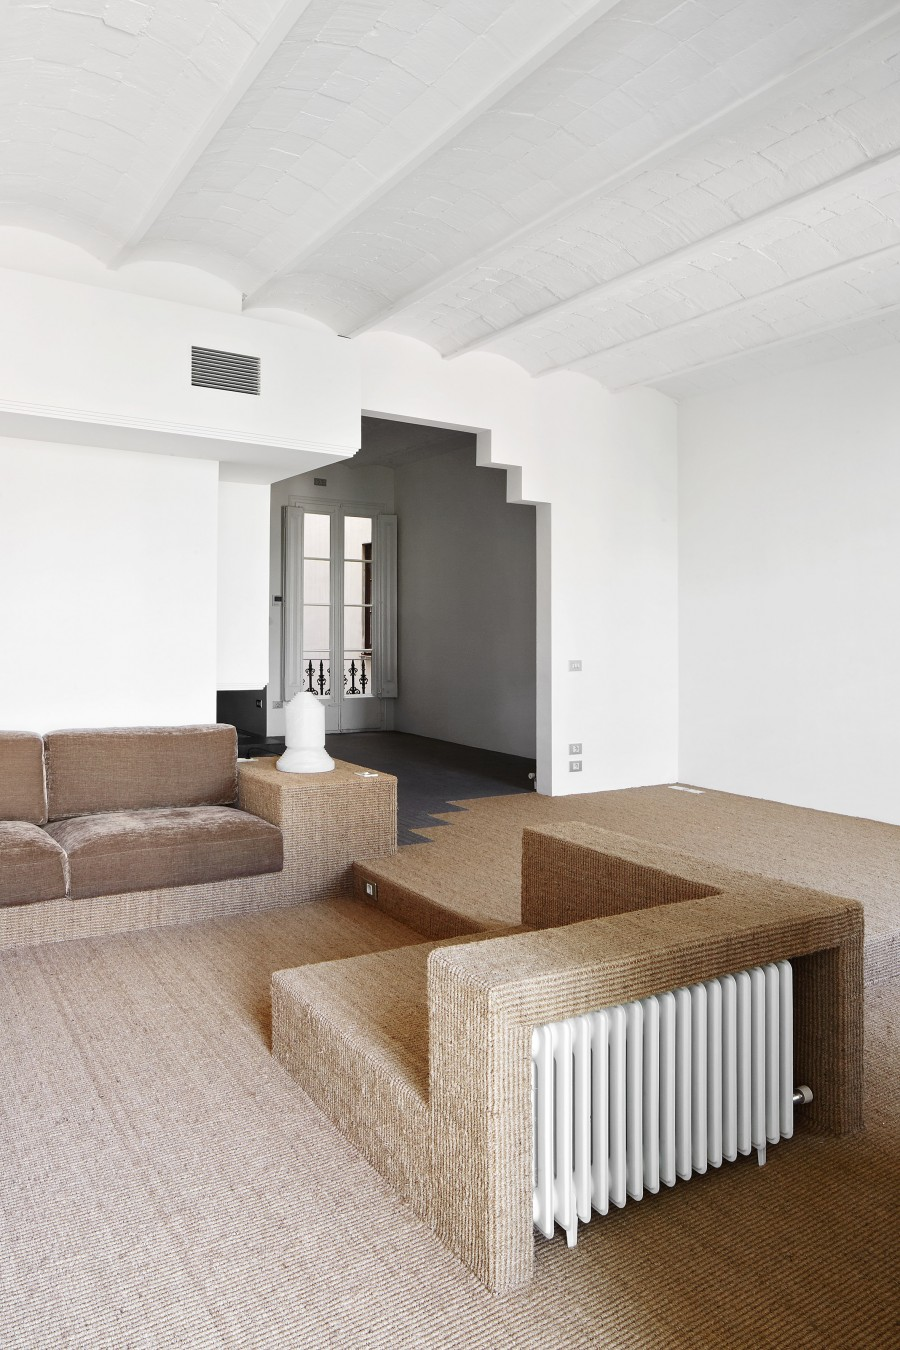 house-girona-barcelona-arquitectura-g-interiors-residential-spain_dezeen_2364_col_1